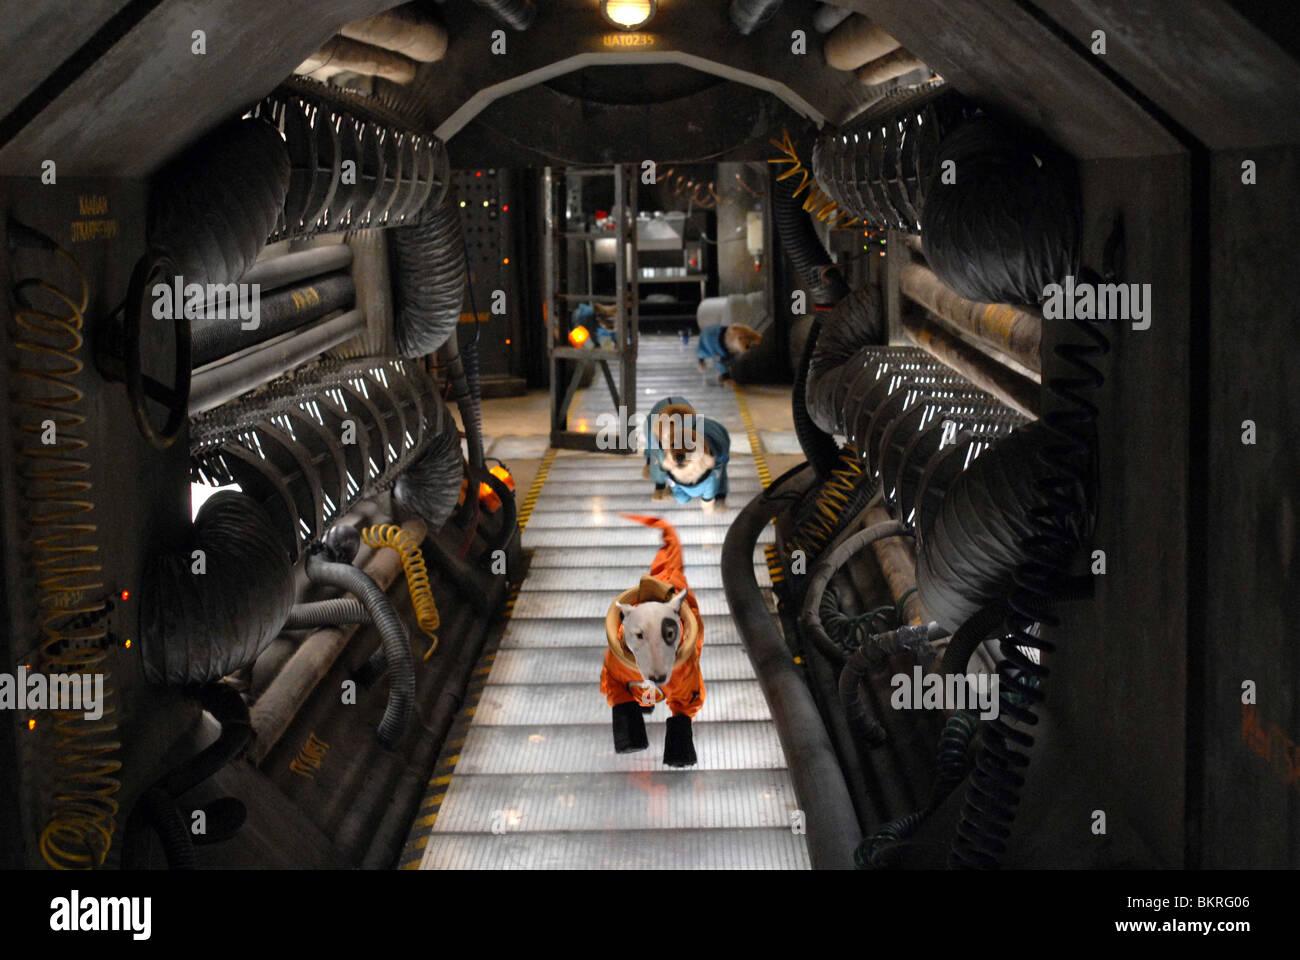 SPACE BUDDIES (2009) ROBERT VINCE (DIR) 002 - Stock Image